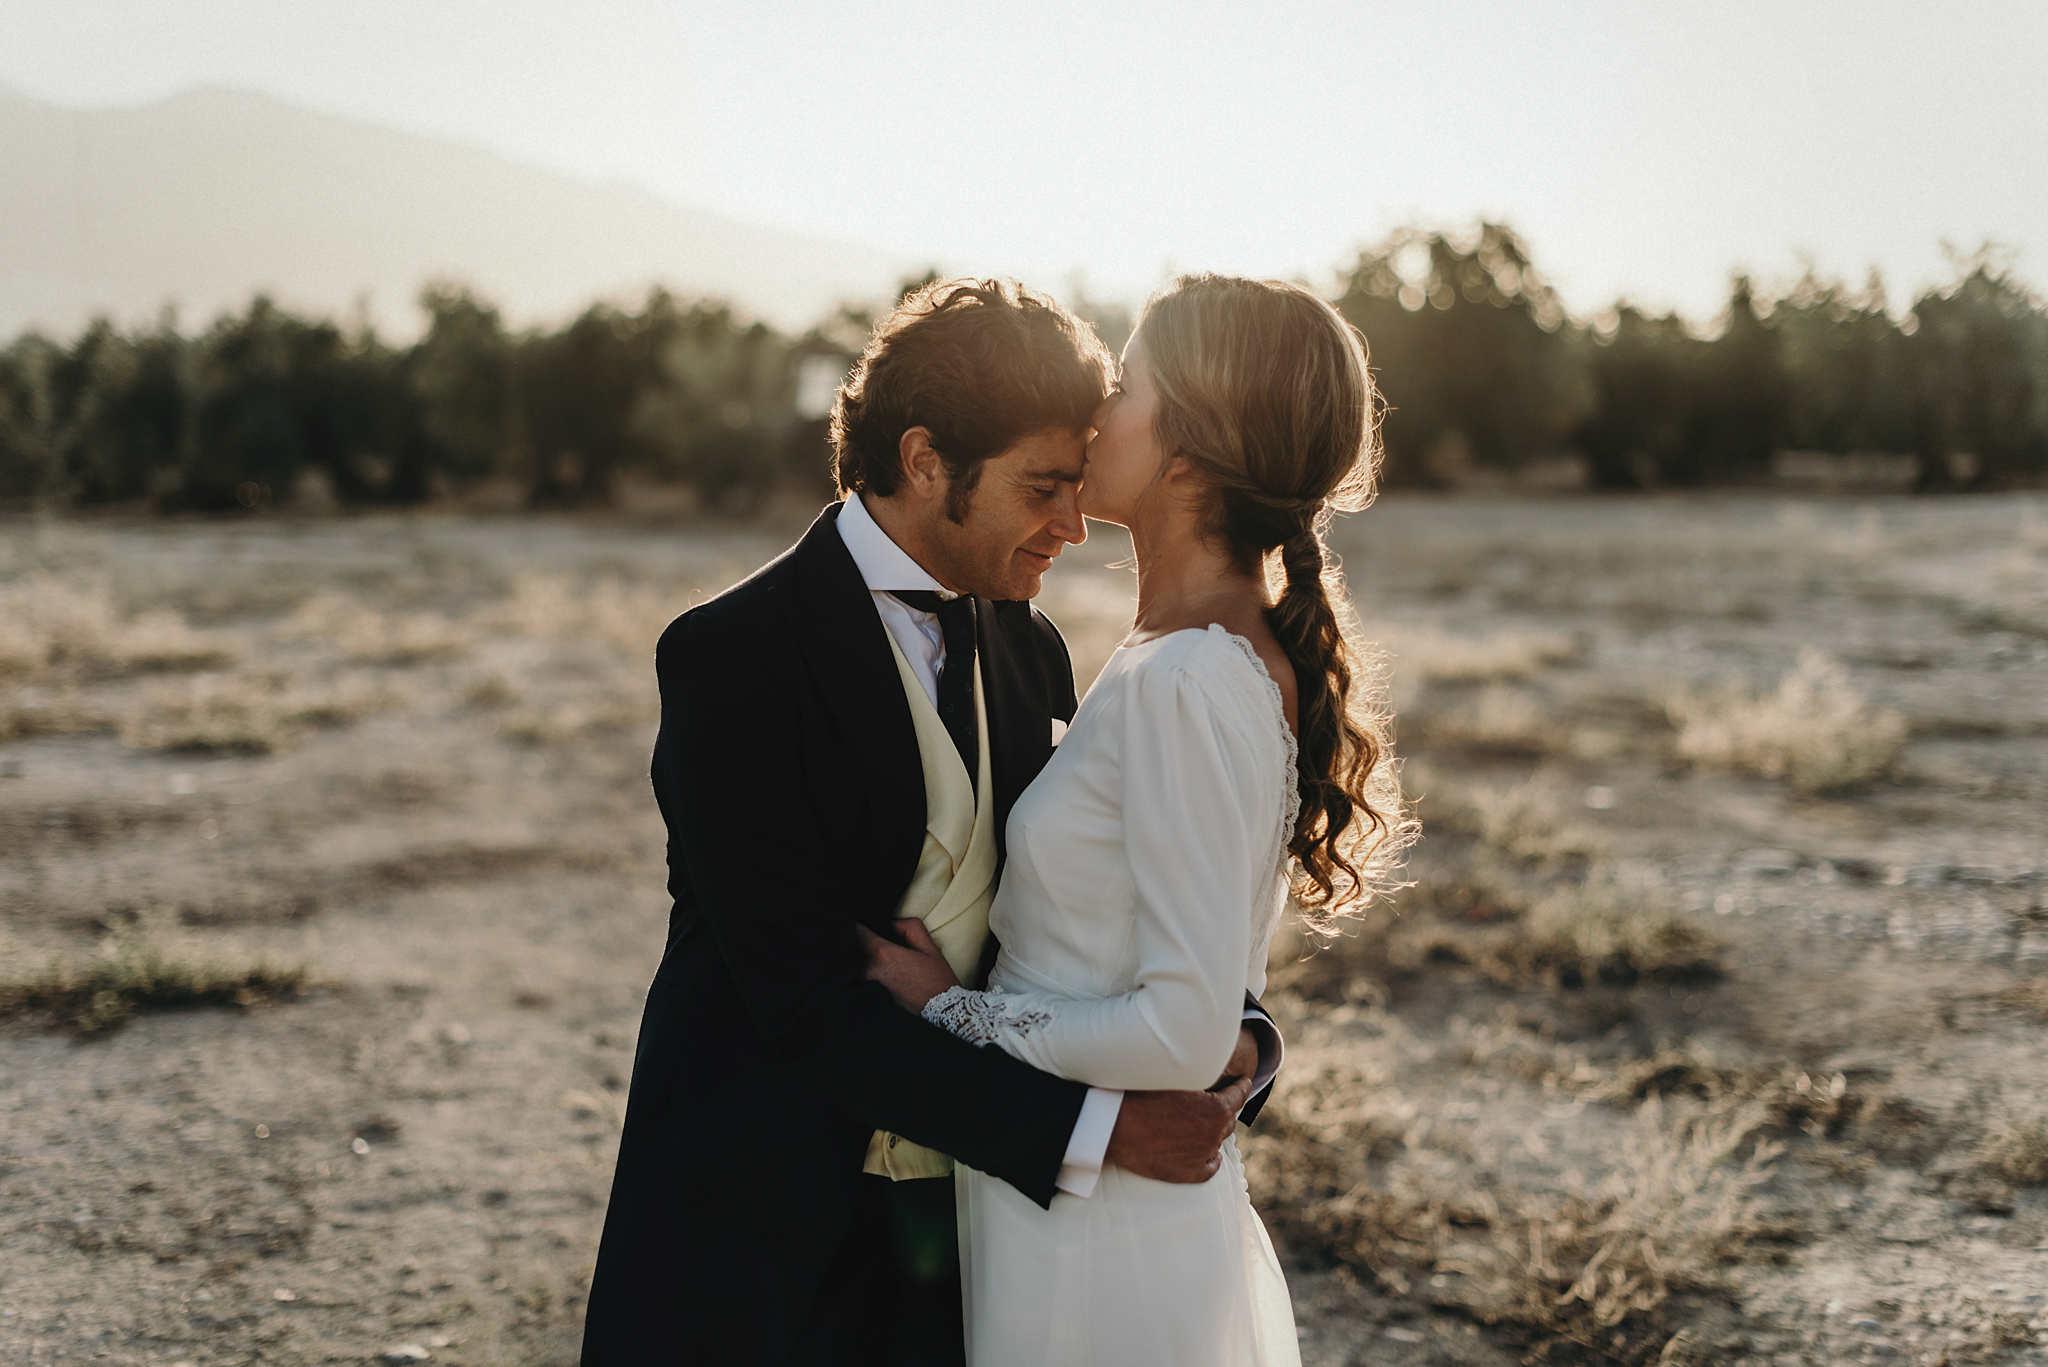 Novia Miguel Crespí - Fotos Gustavo Pozo - fotógrafo de bodas